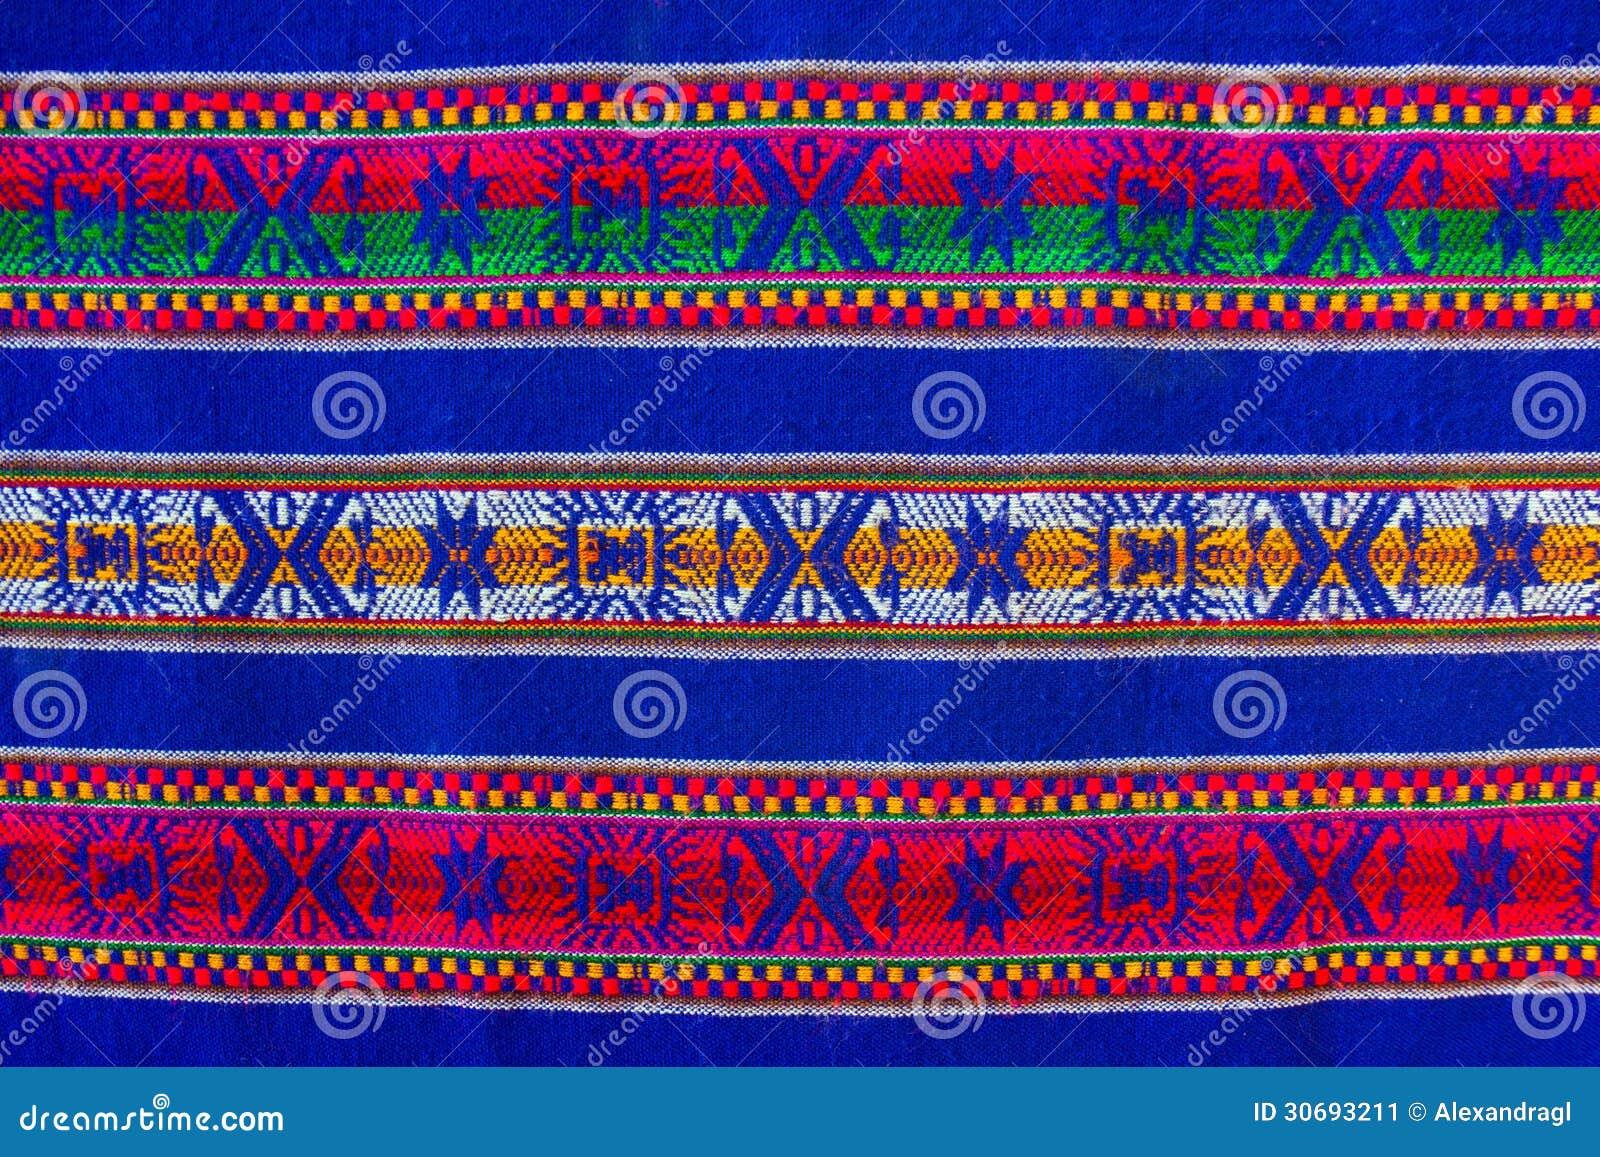 Bolivian Pattern Stock Image Image Of Aboriginal